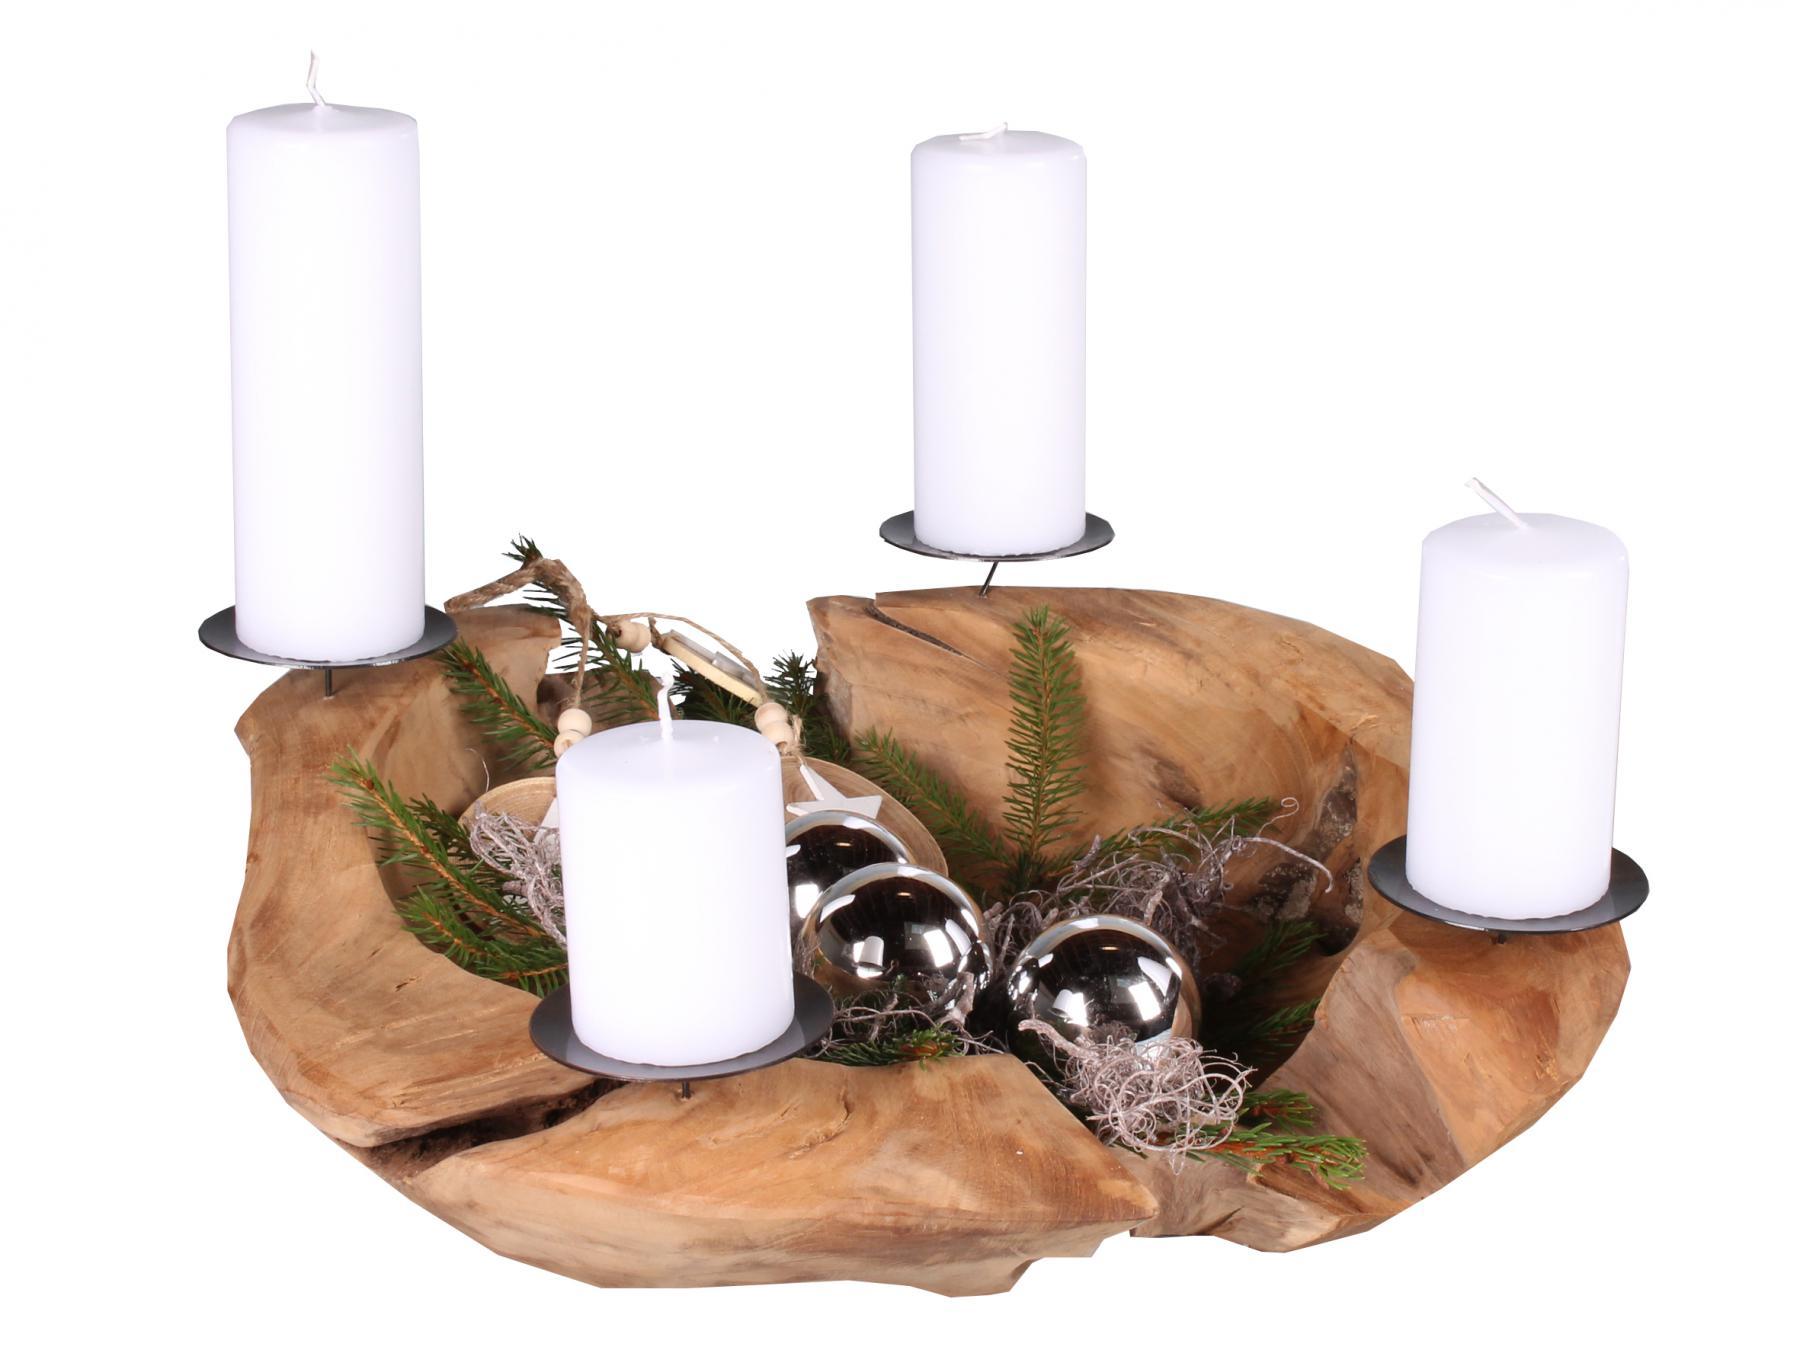 adventskranz aus teakholz 50 cm weihnachtsdekoration. Black Bedroom Furniture Sets. Home Design Ideas